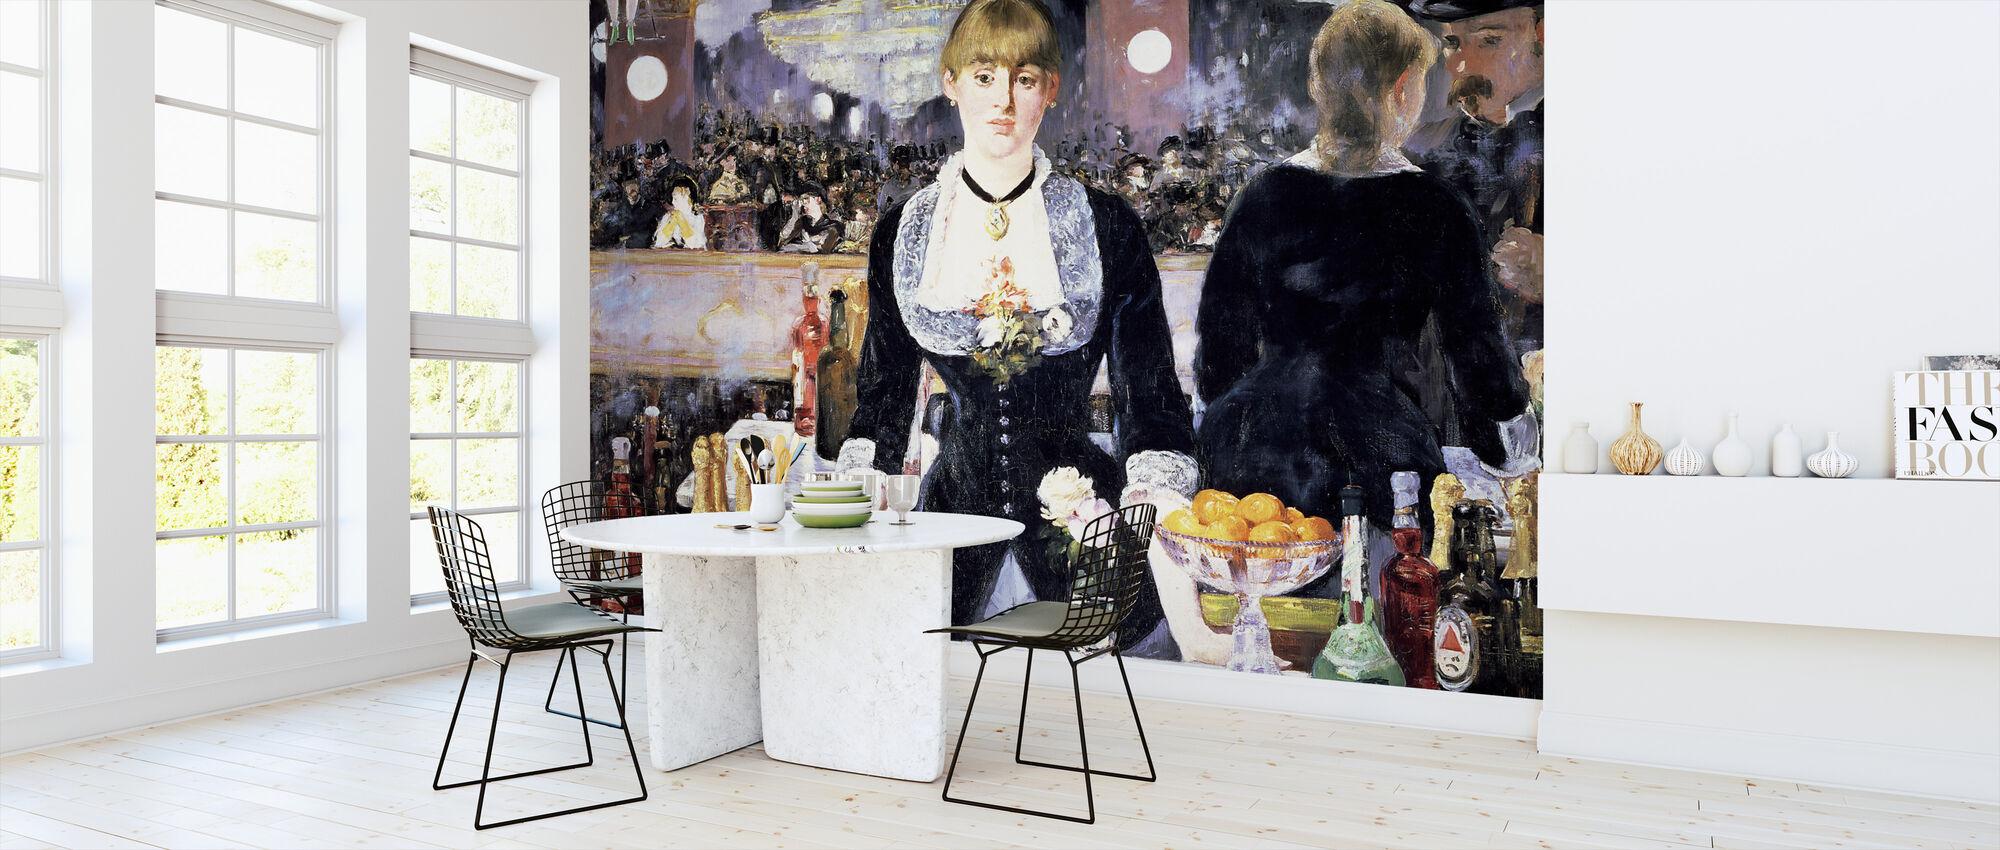 Bar at Folies-Bergere, Edouard Manet - Wallpaper - Kitchen